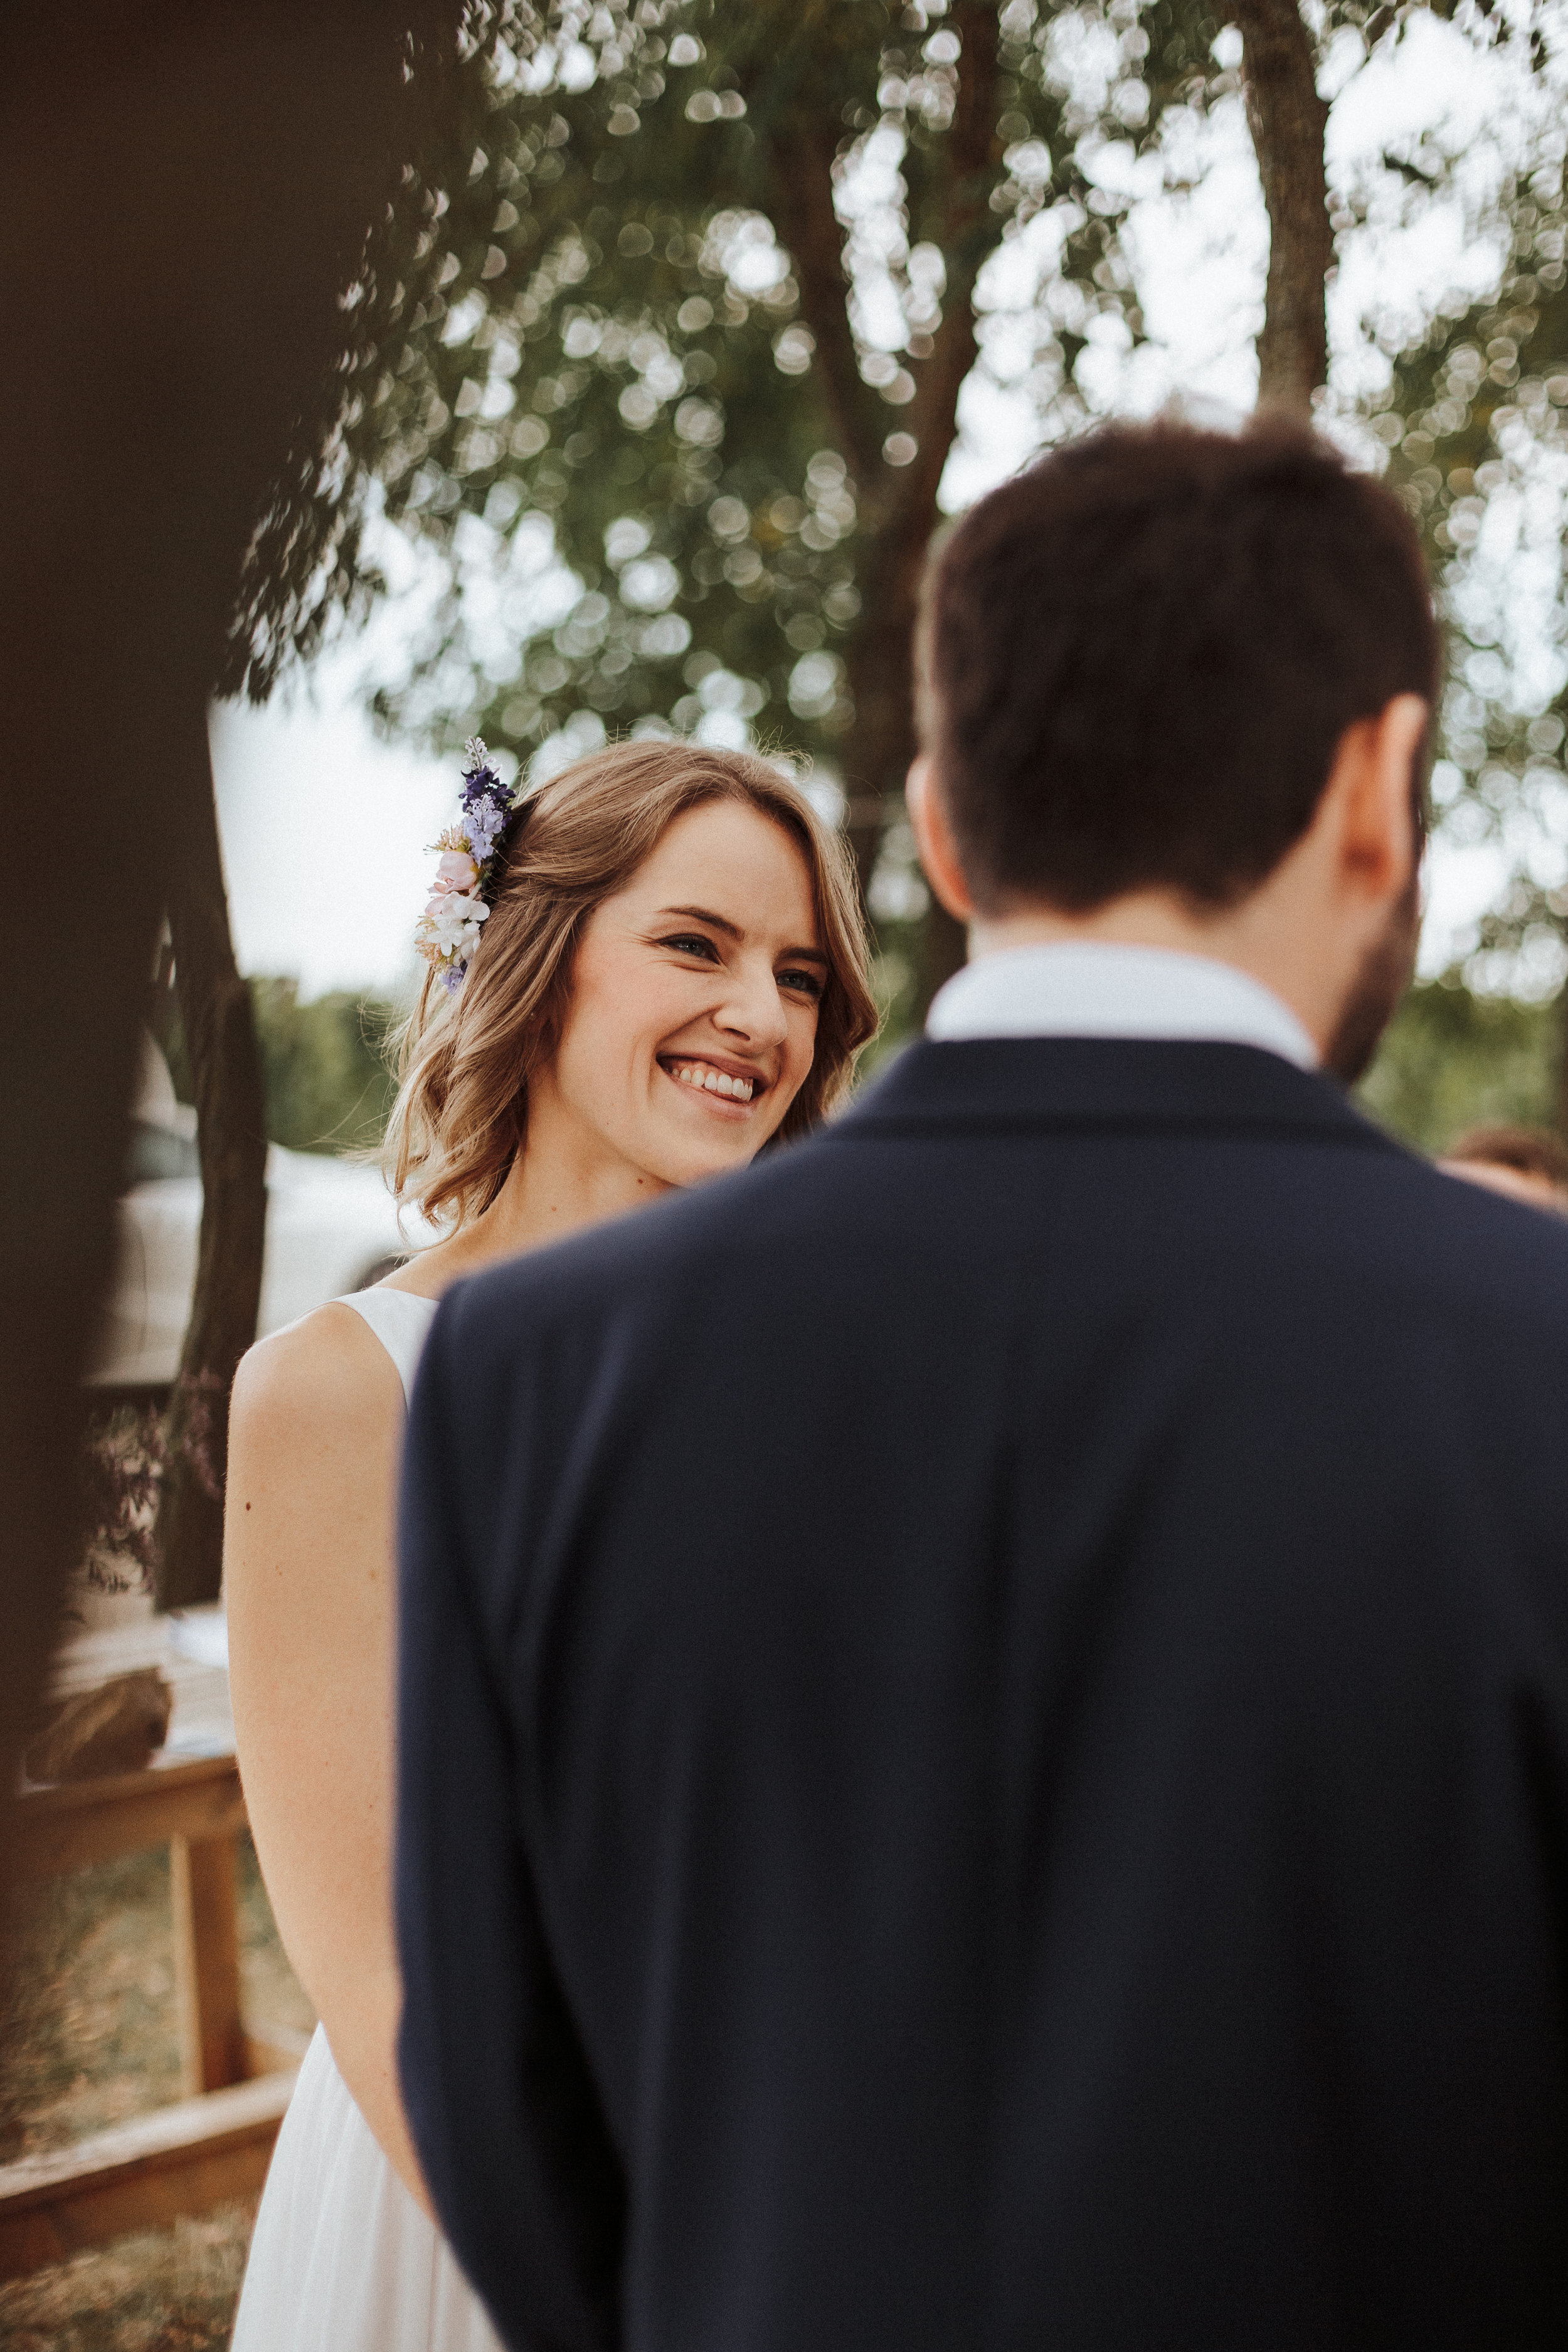 20170902_Monika+Marci_wedding_f_363__MG_3170.jpg